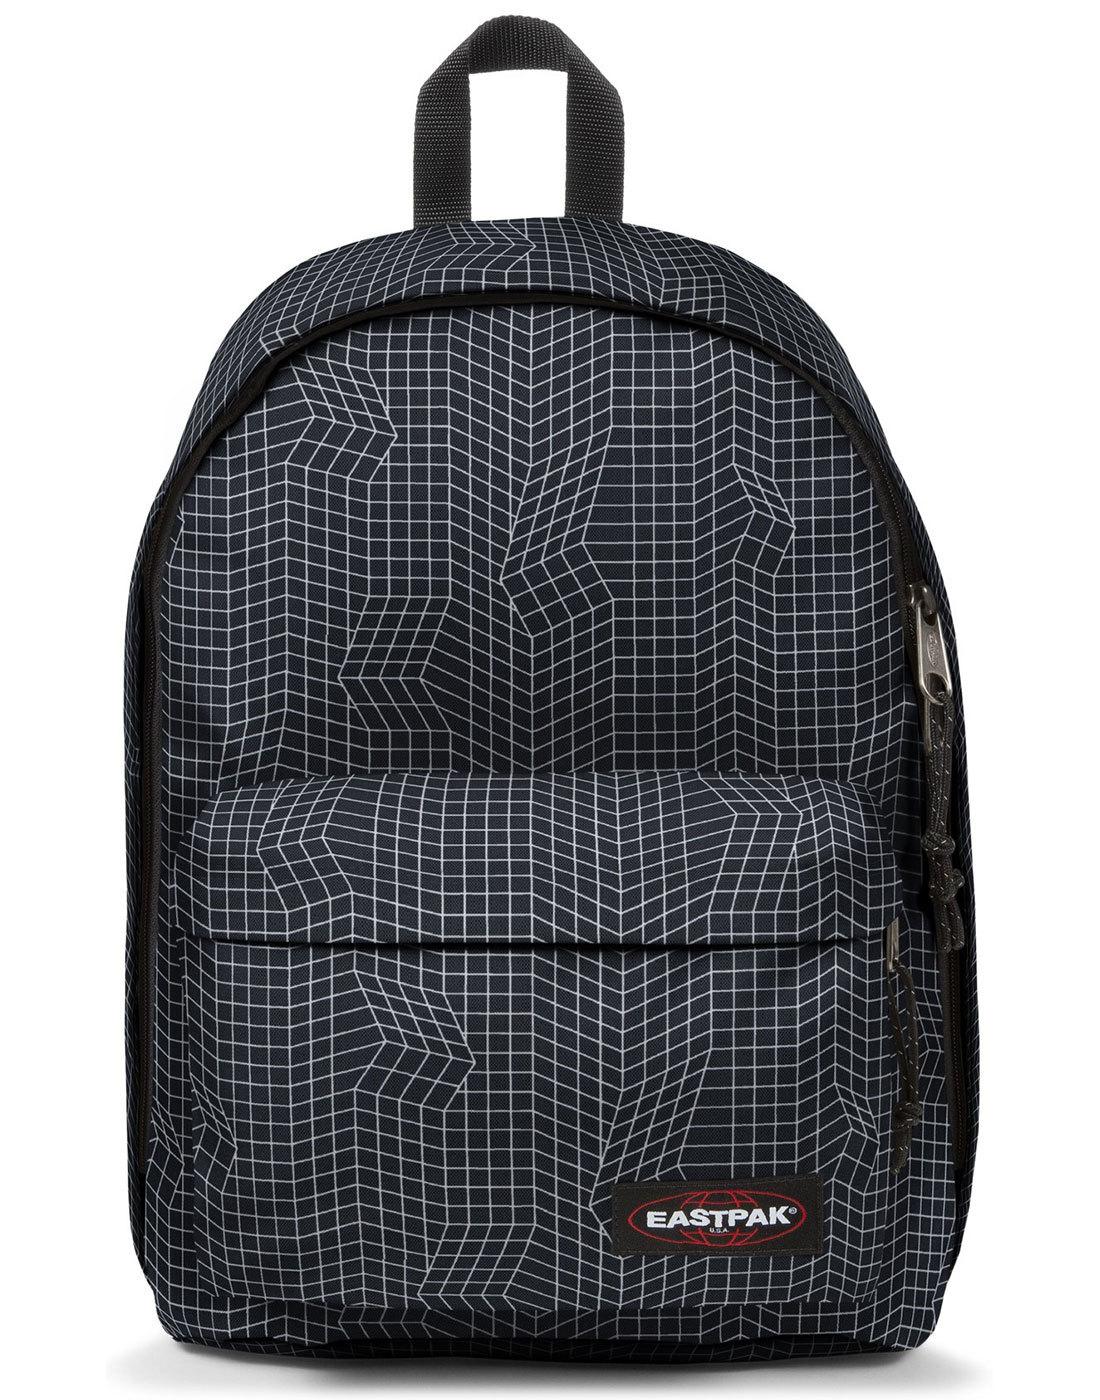 Out Of Office EASTPAK Black Dance Laptop Backpack